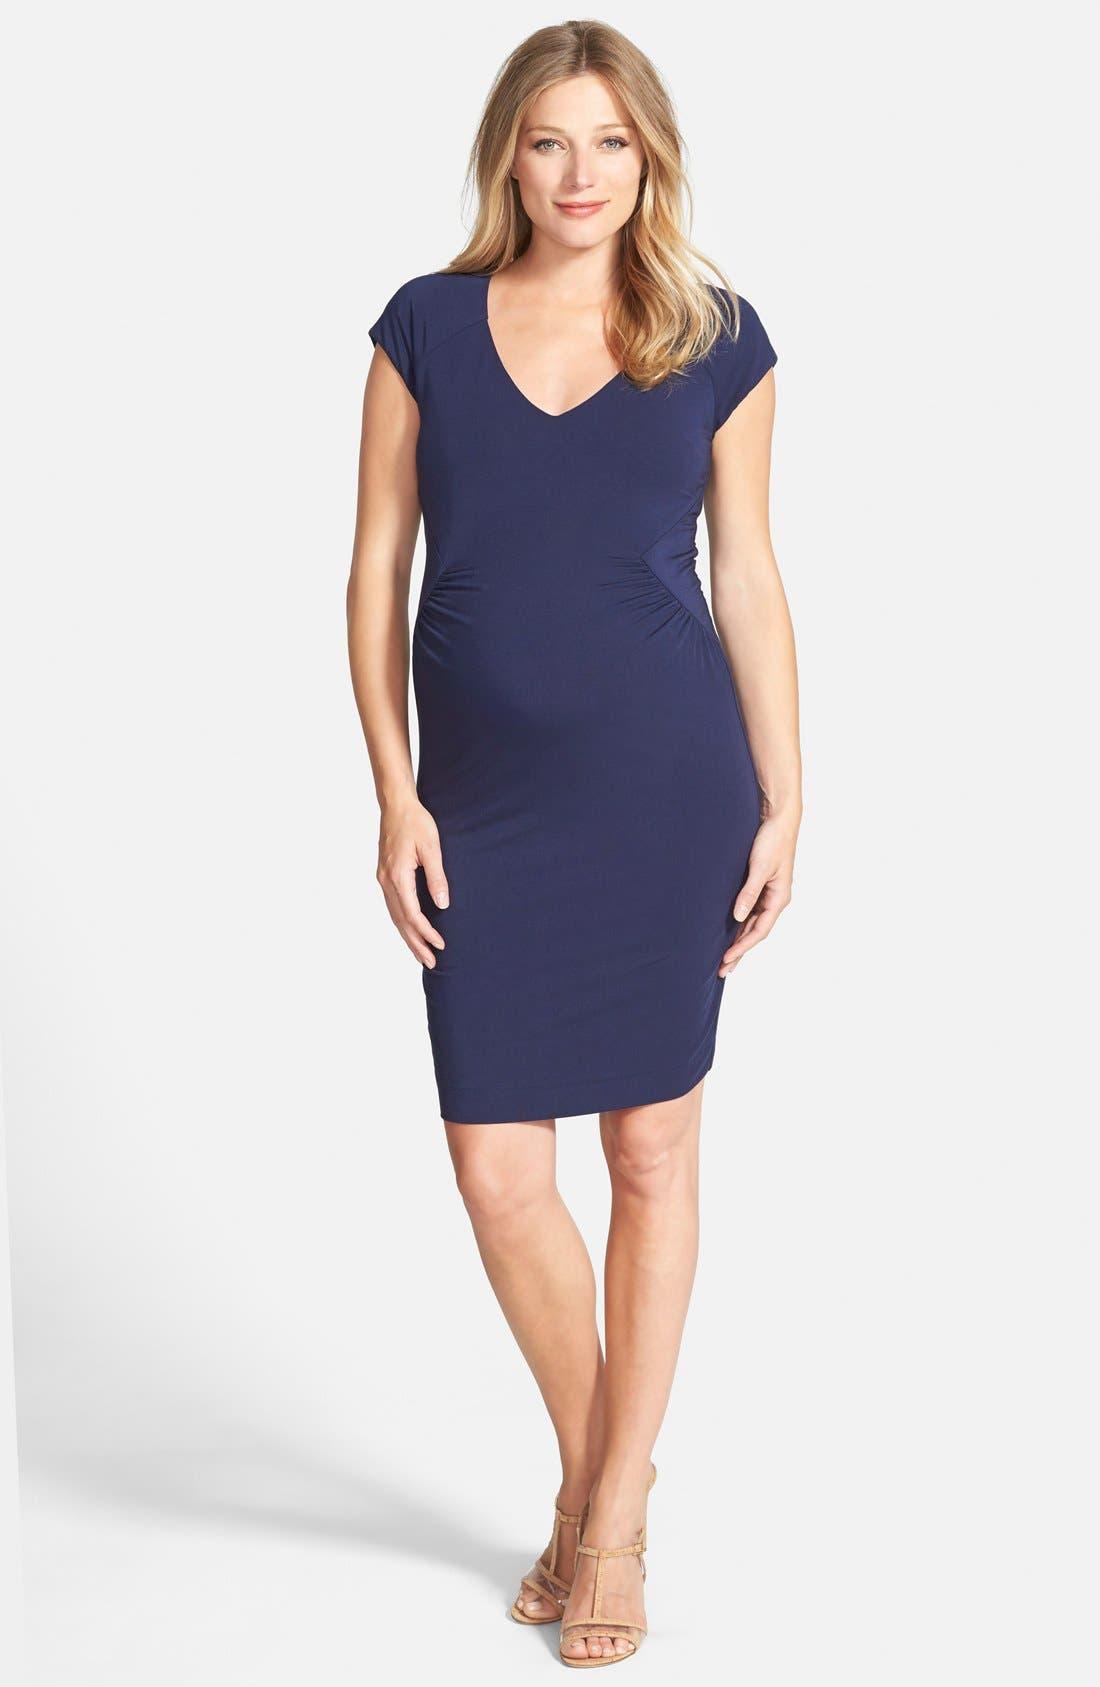 Main Image - Tart Maternity 'Freya' Print Body-Con Maternity Dress